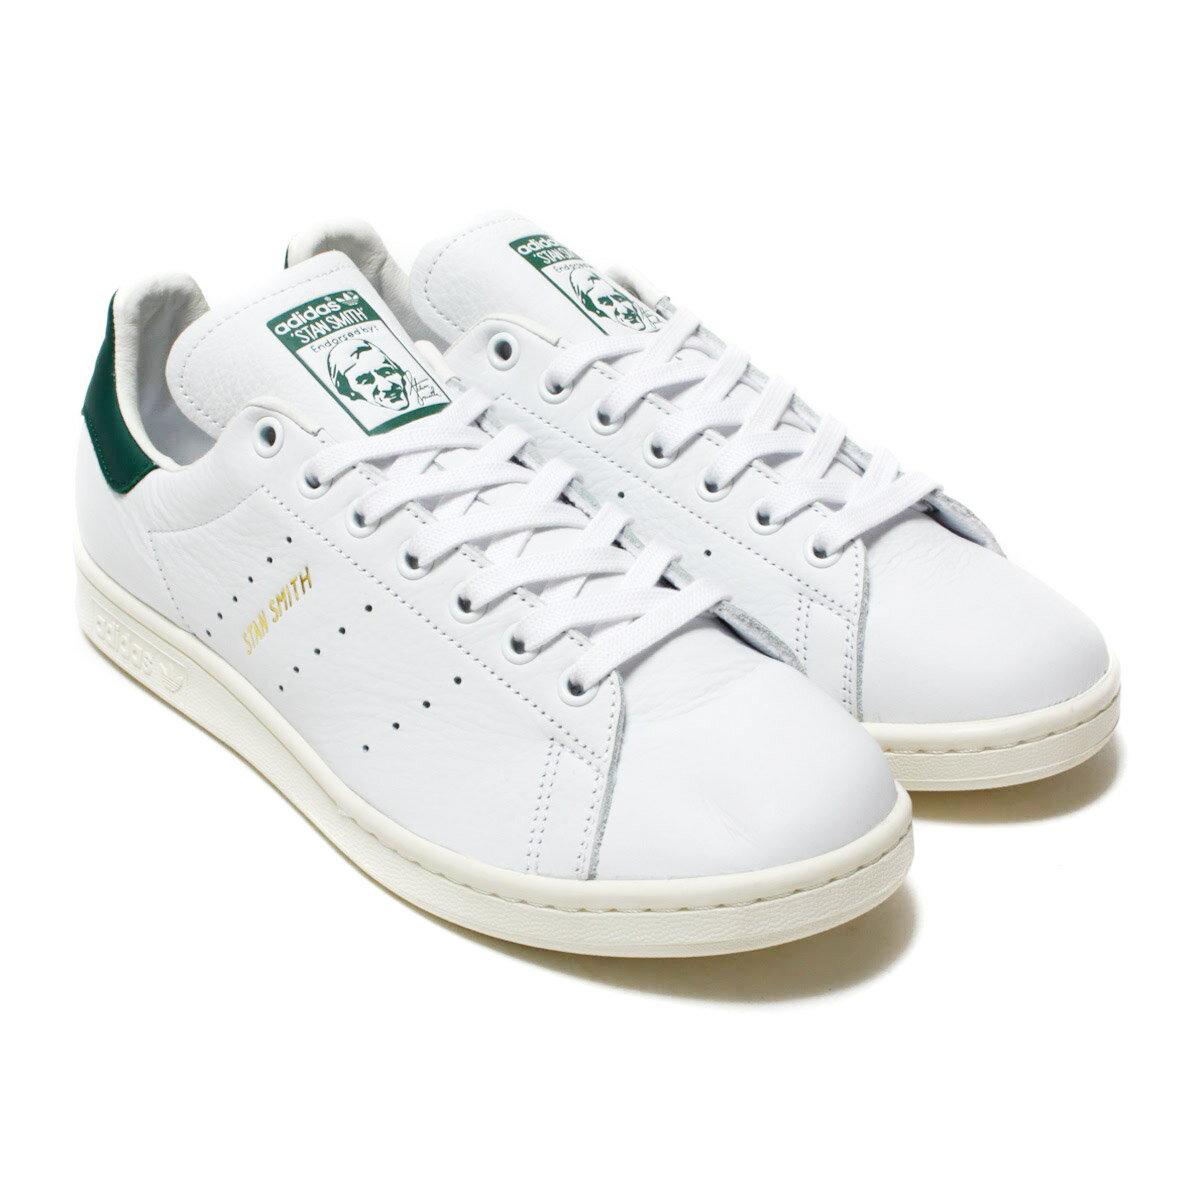 adidas Originals STAN SMITH(アディダス オリジナルス スタンスミス)Running White/Running White/Collegiate Green【メンズ レディース スニーカー】18SS-I